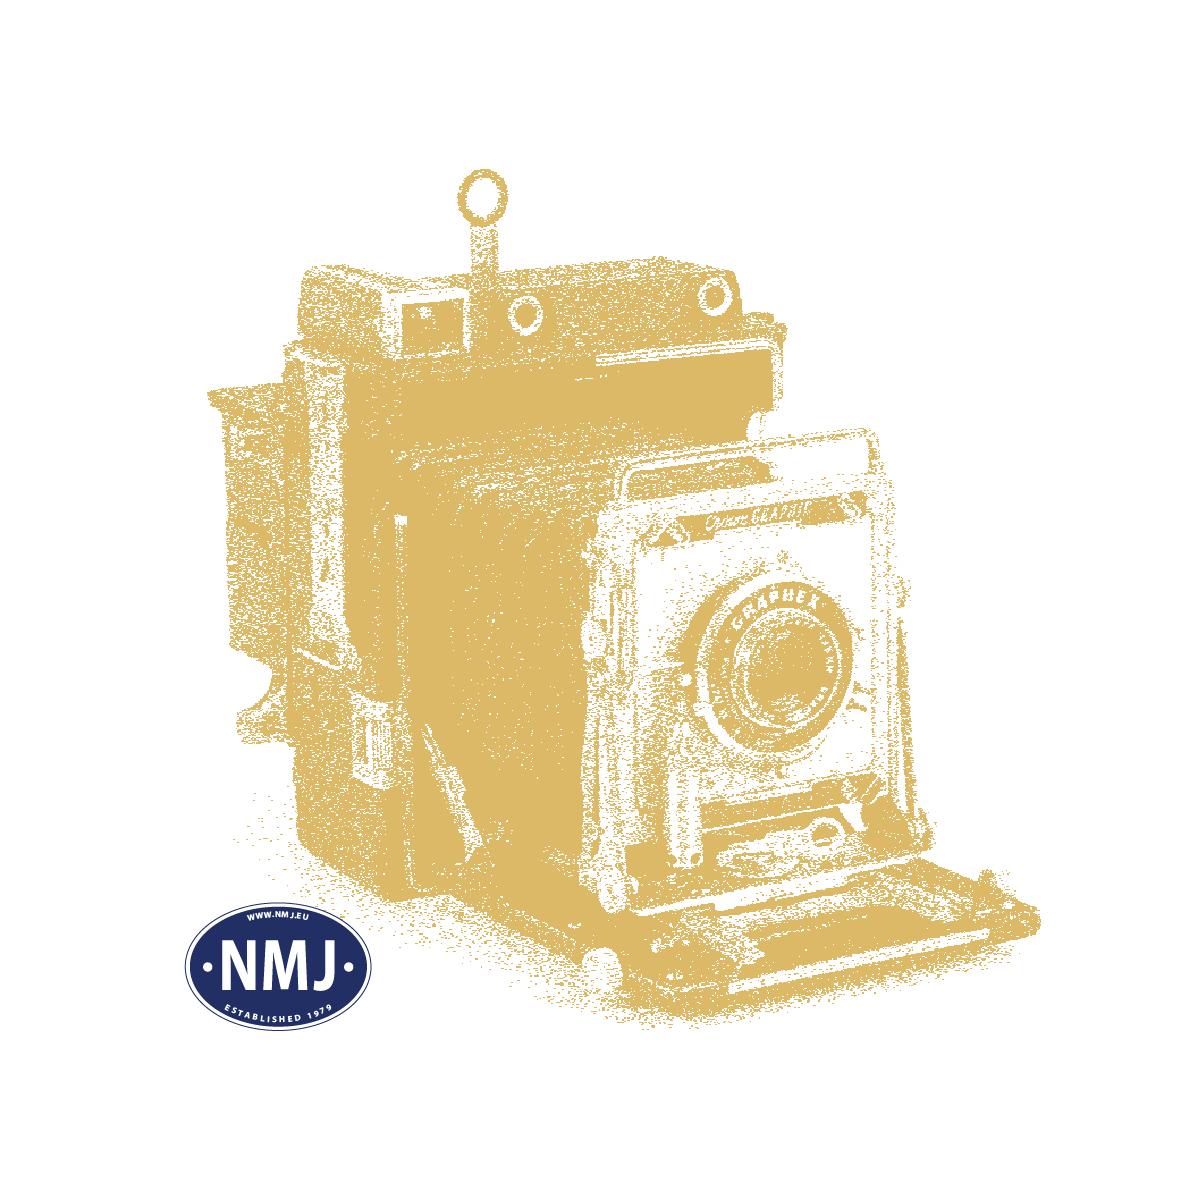 MBR55-1017 - Gressmatte #17, 30 x 40 Cm